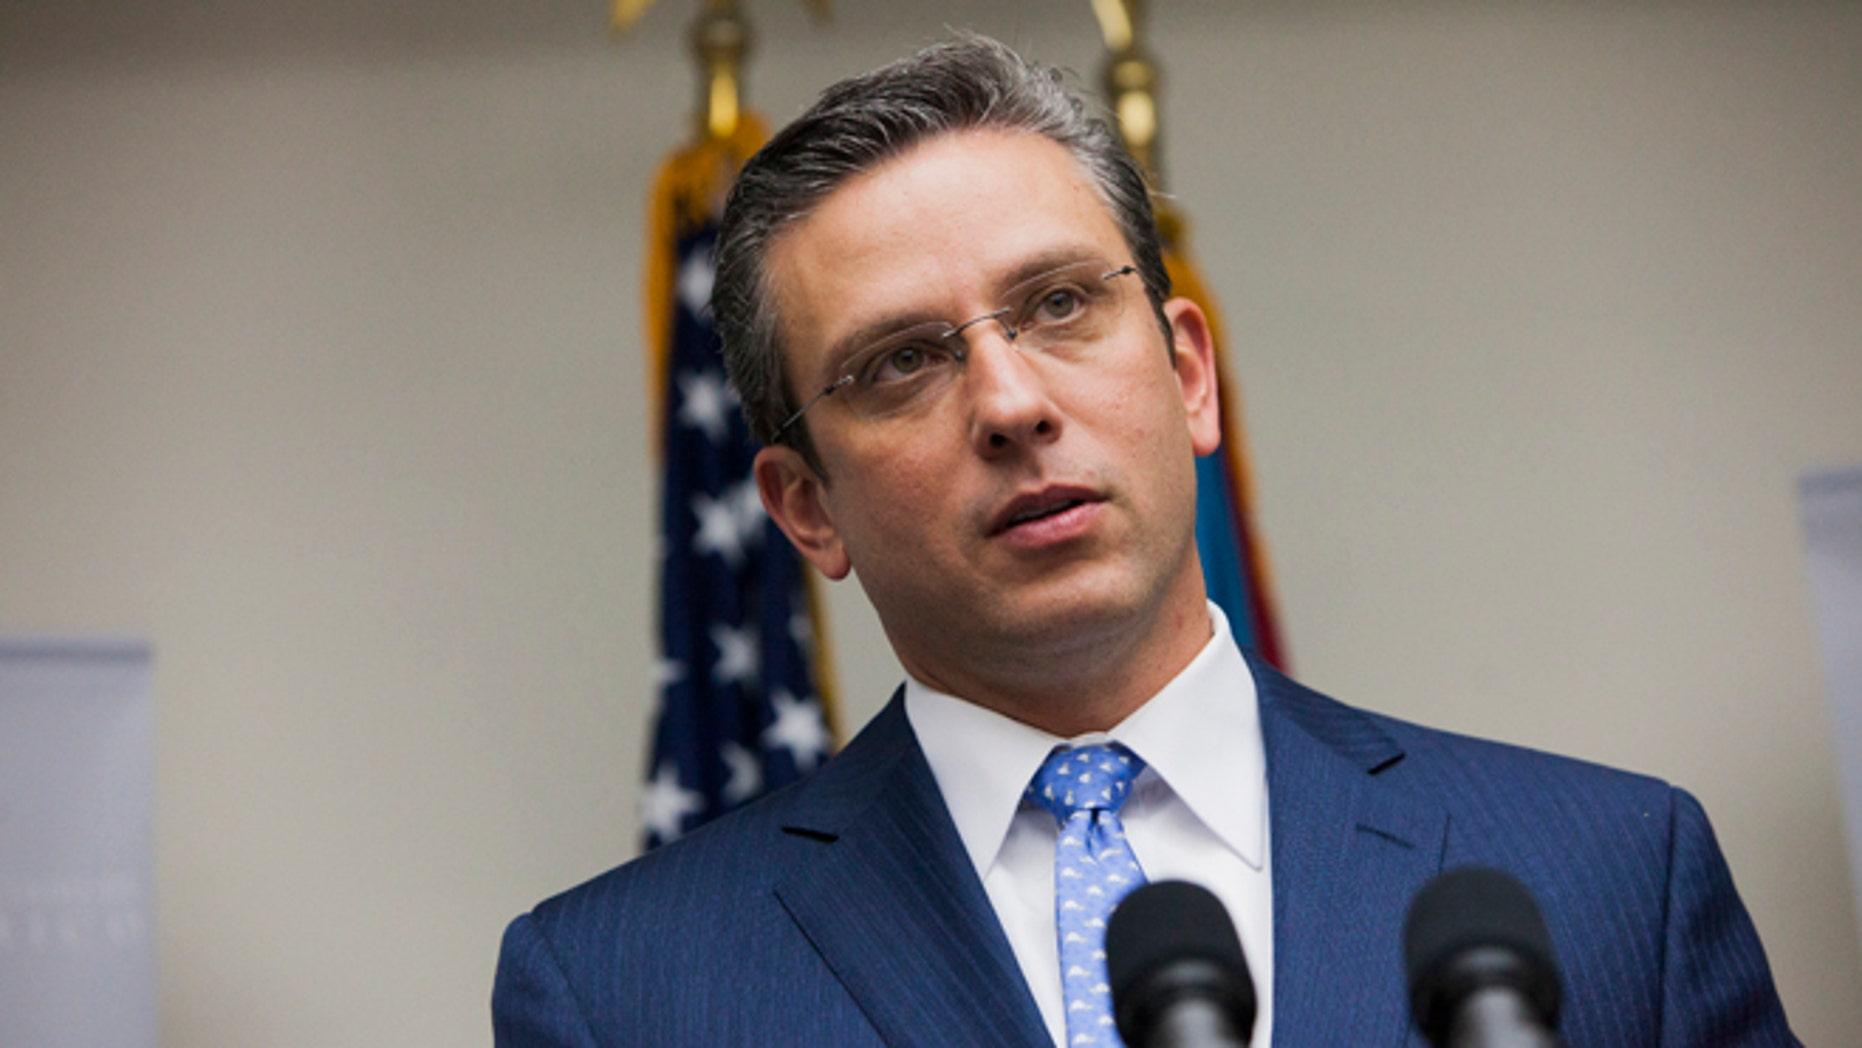 Governor Alejandro Garca Padilla on November 14, 2013 in San Juan, Puerto Rico.